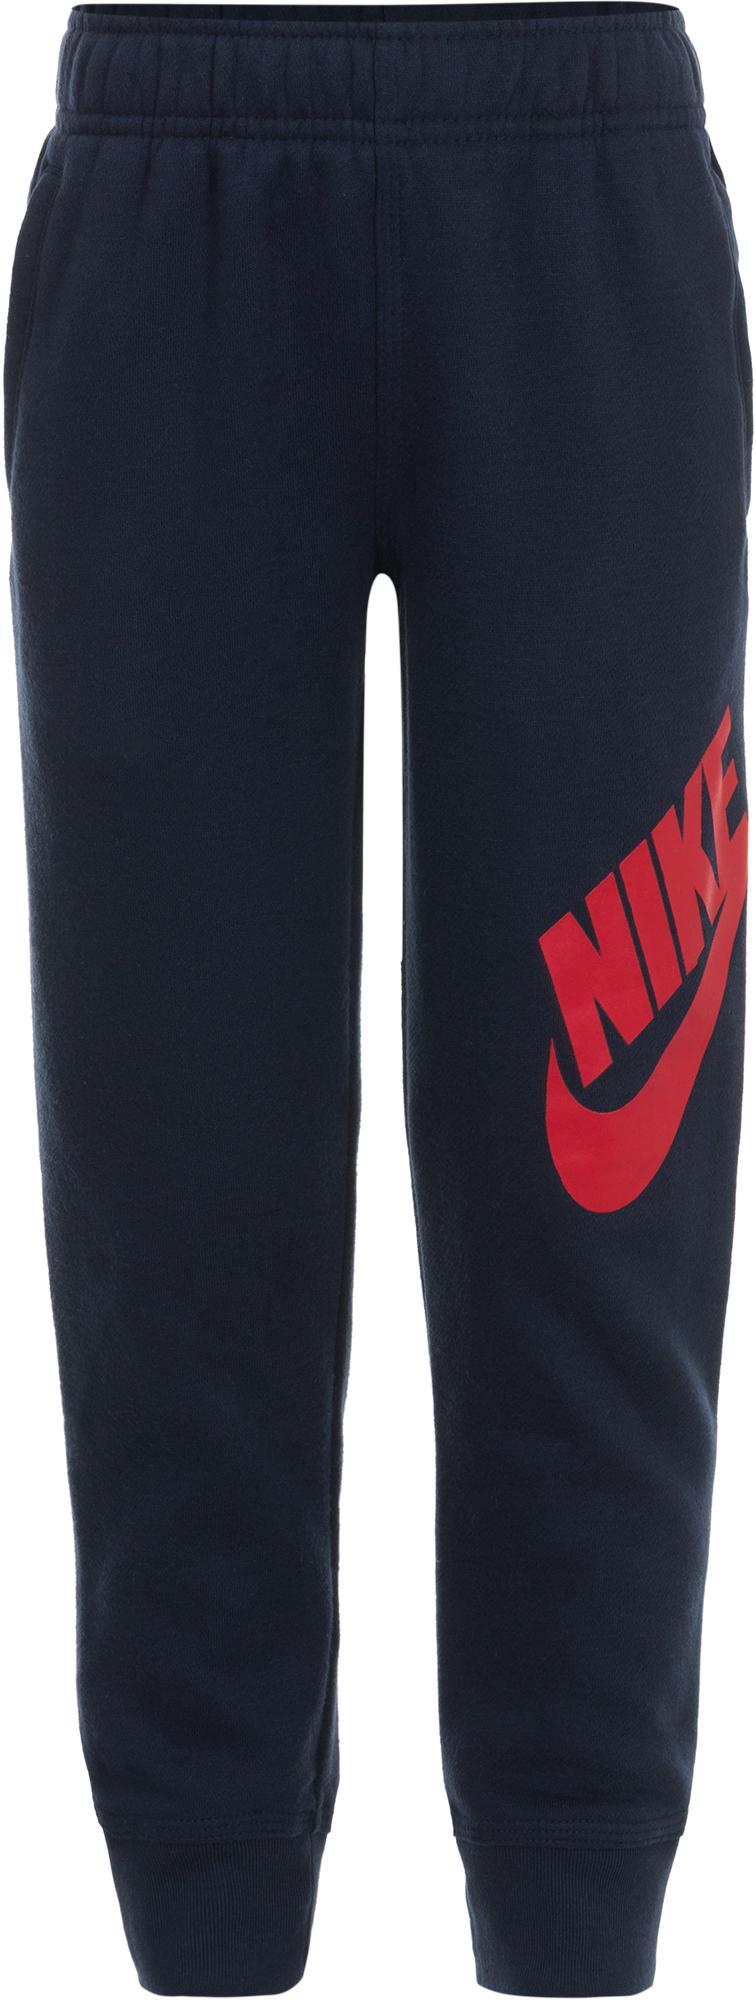 все цены на Nike Брюки для мальчиков Nike Futura Cuff, размер 122